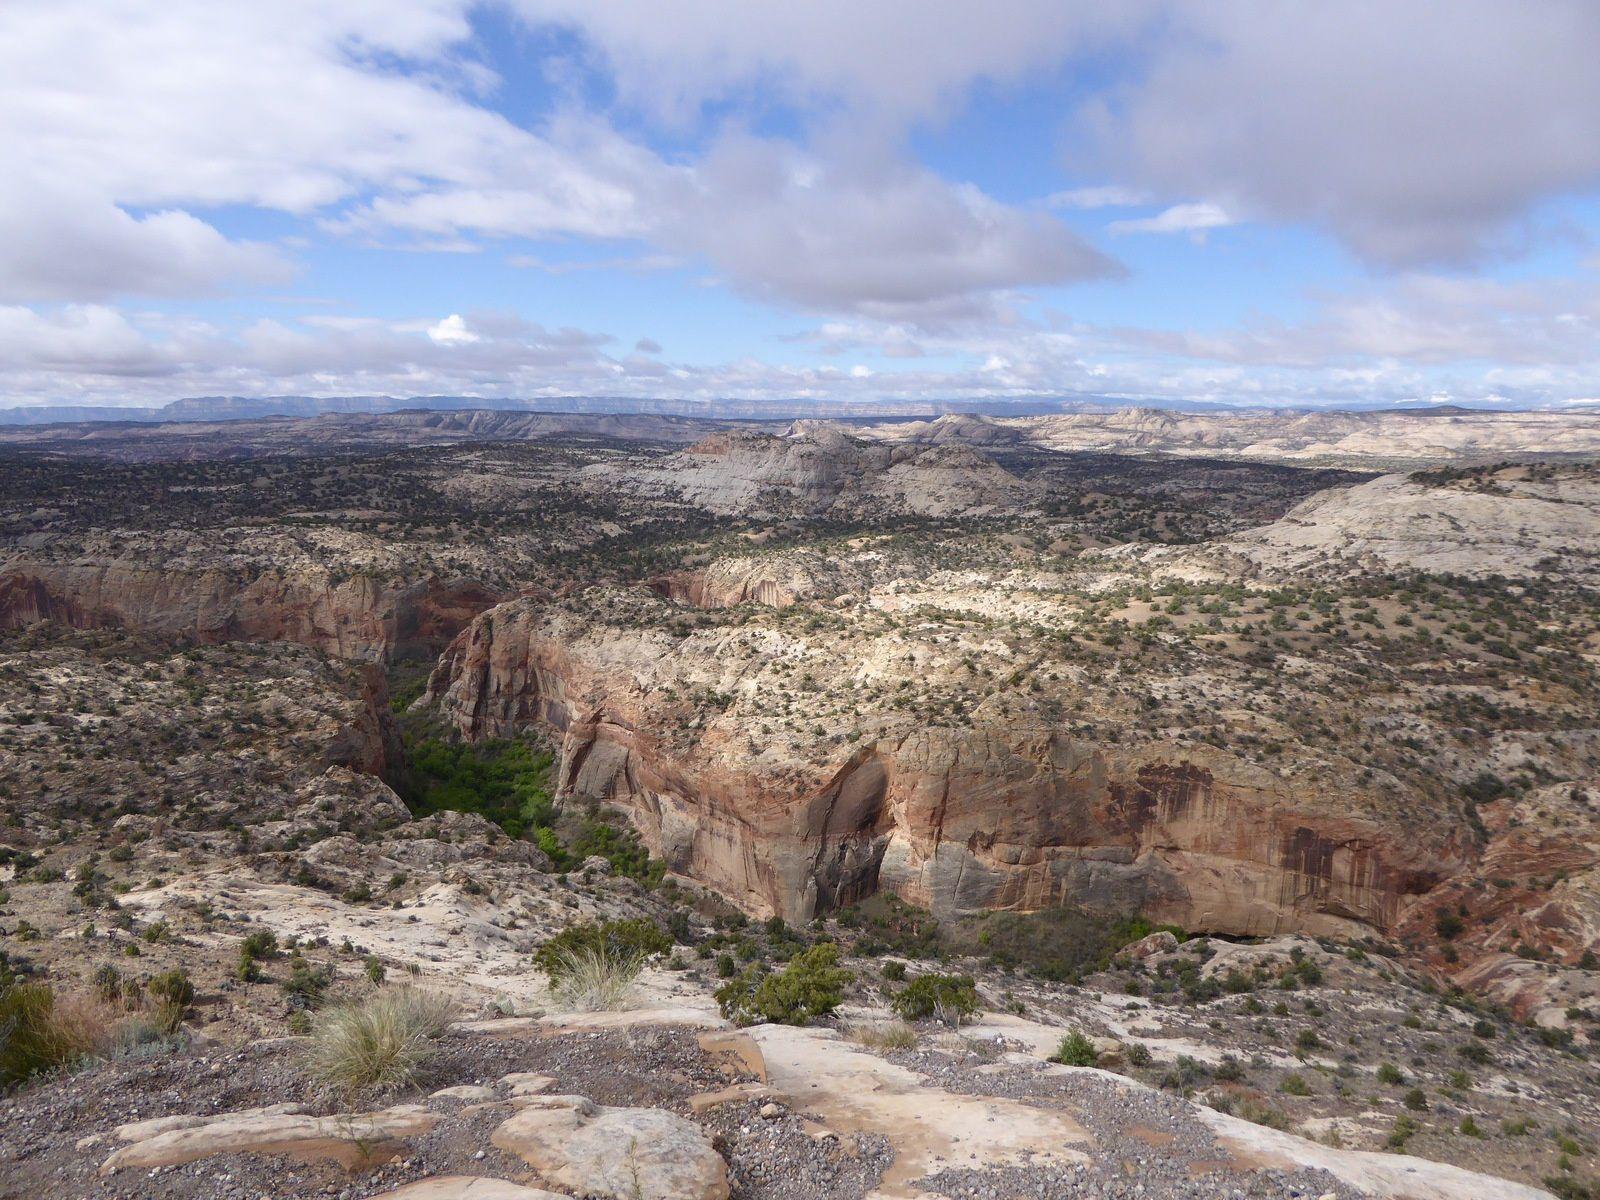 Ouest-Américain, Bryce Canyon - Printemps 2016.